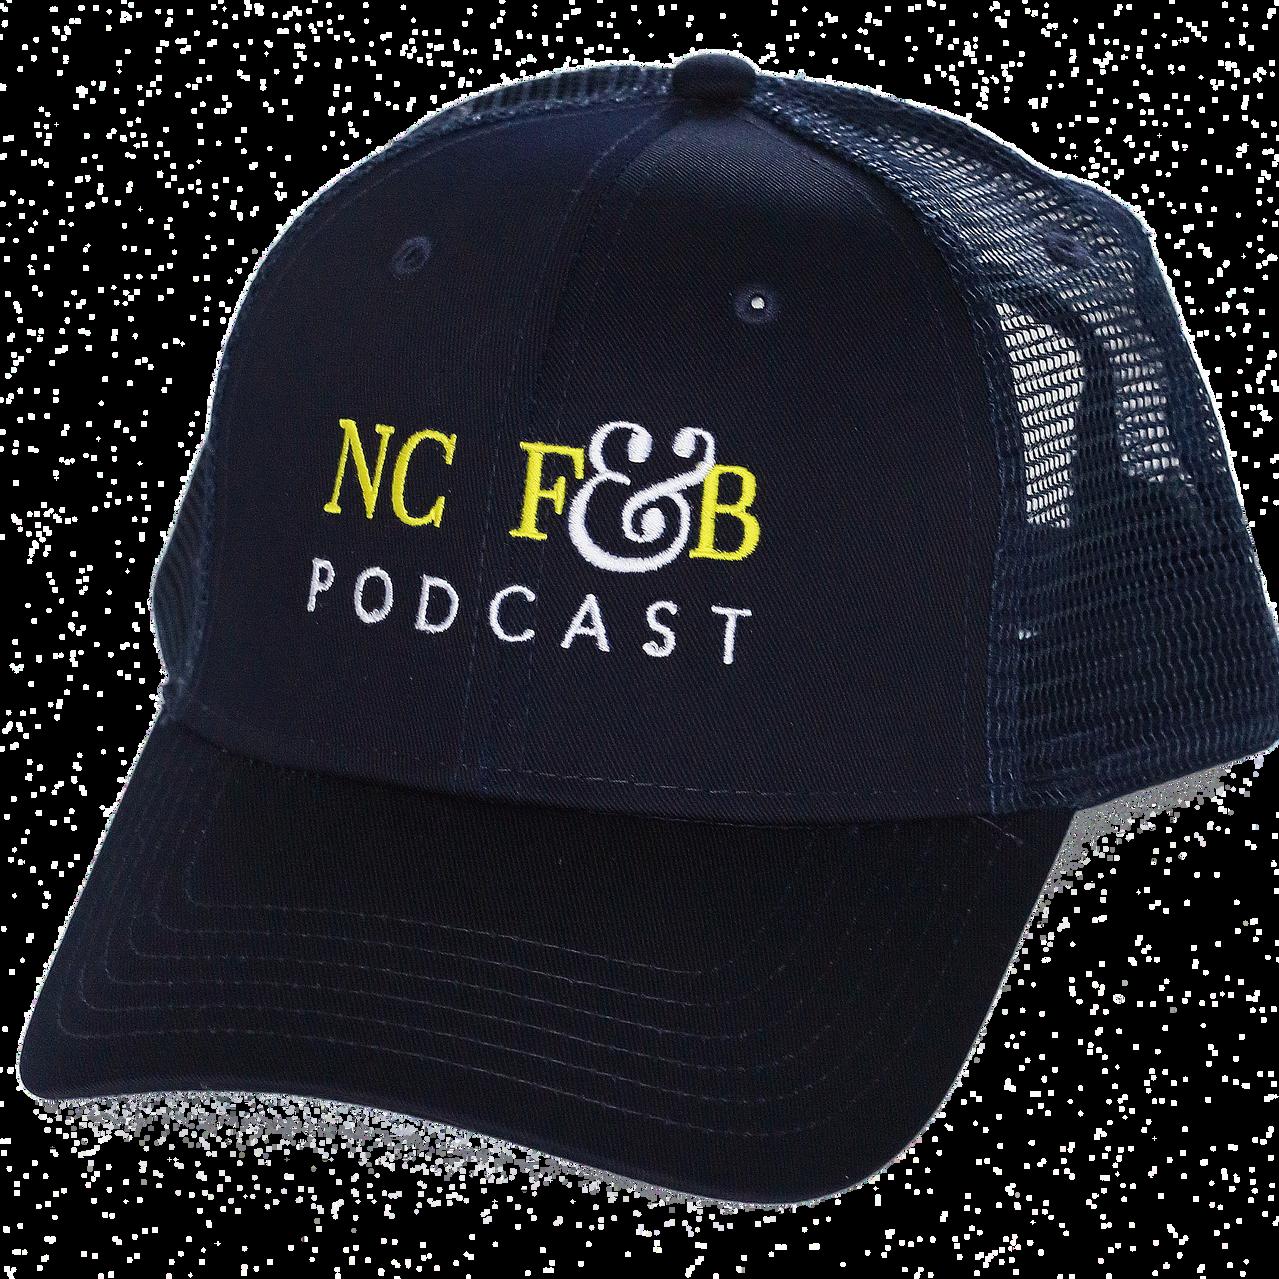 NC FB Podcast Hat